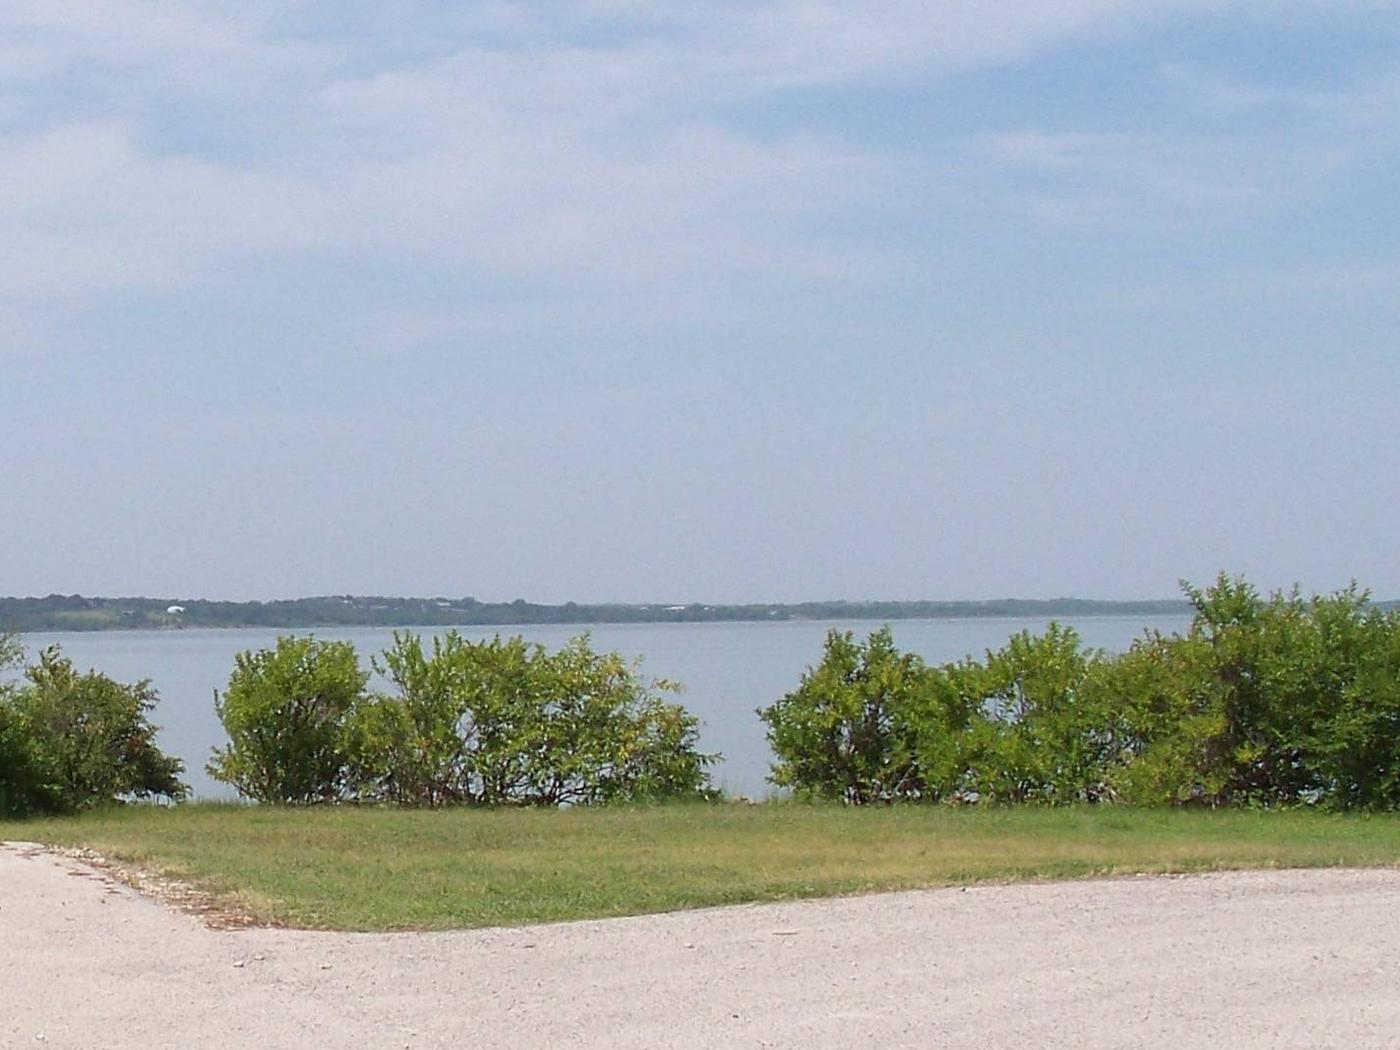 View of lake at Pecan Point